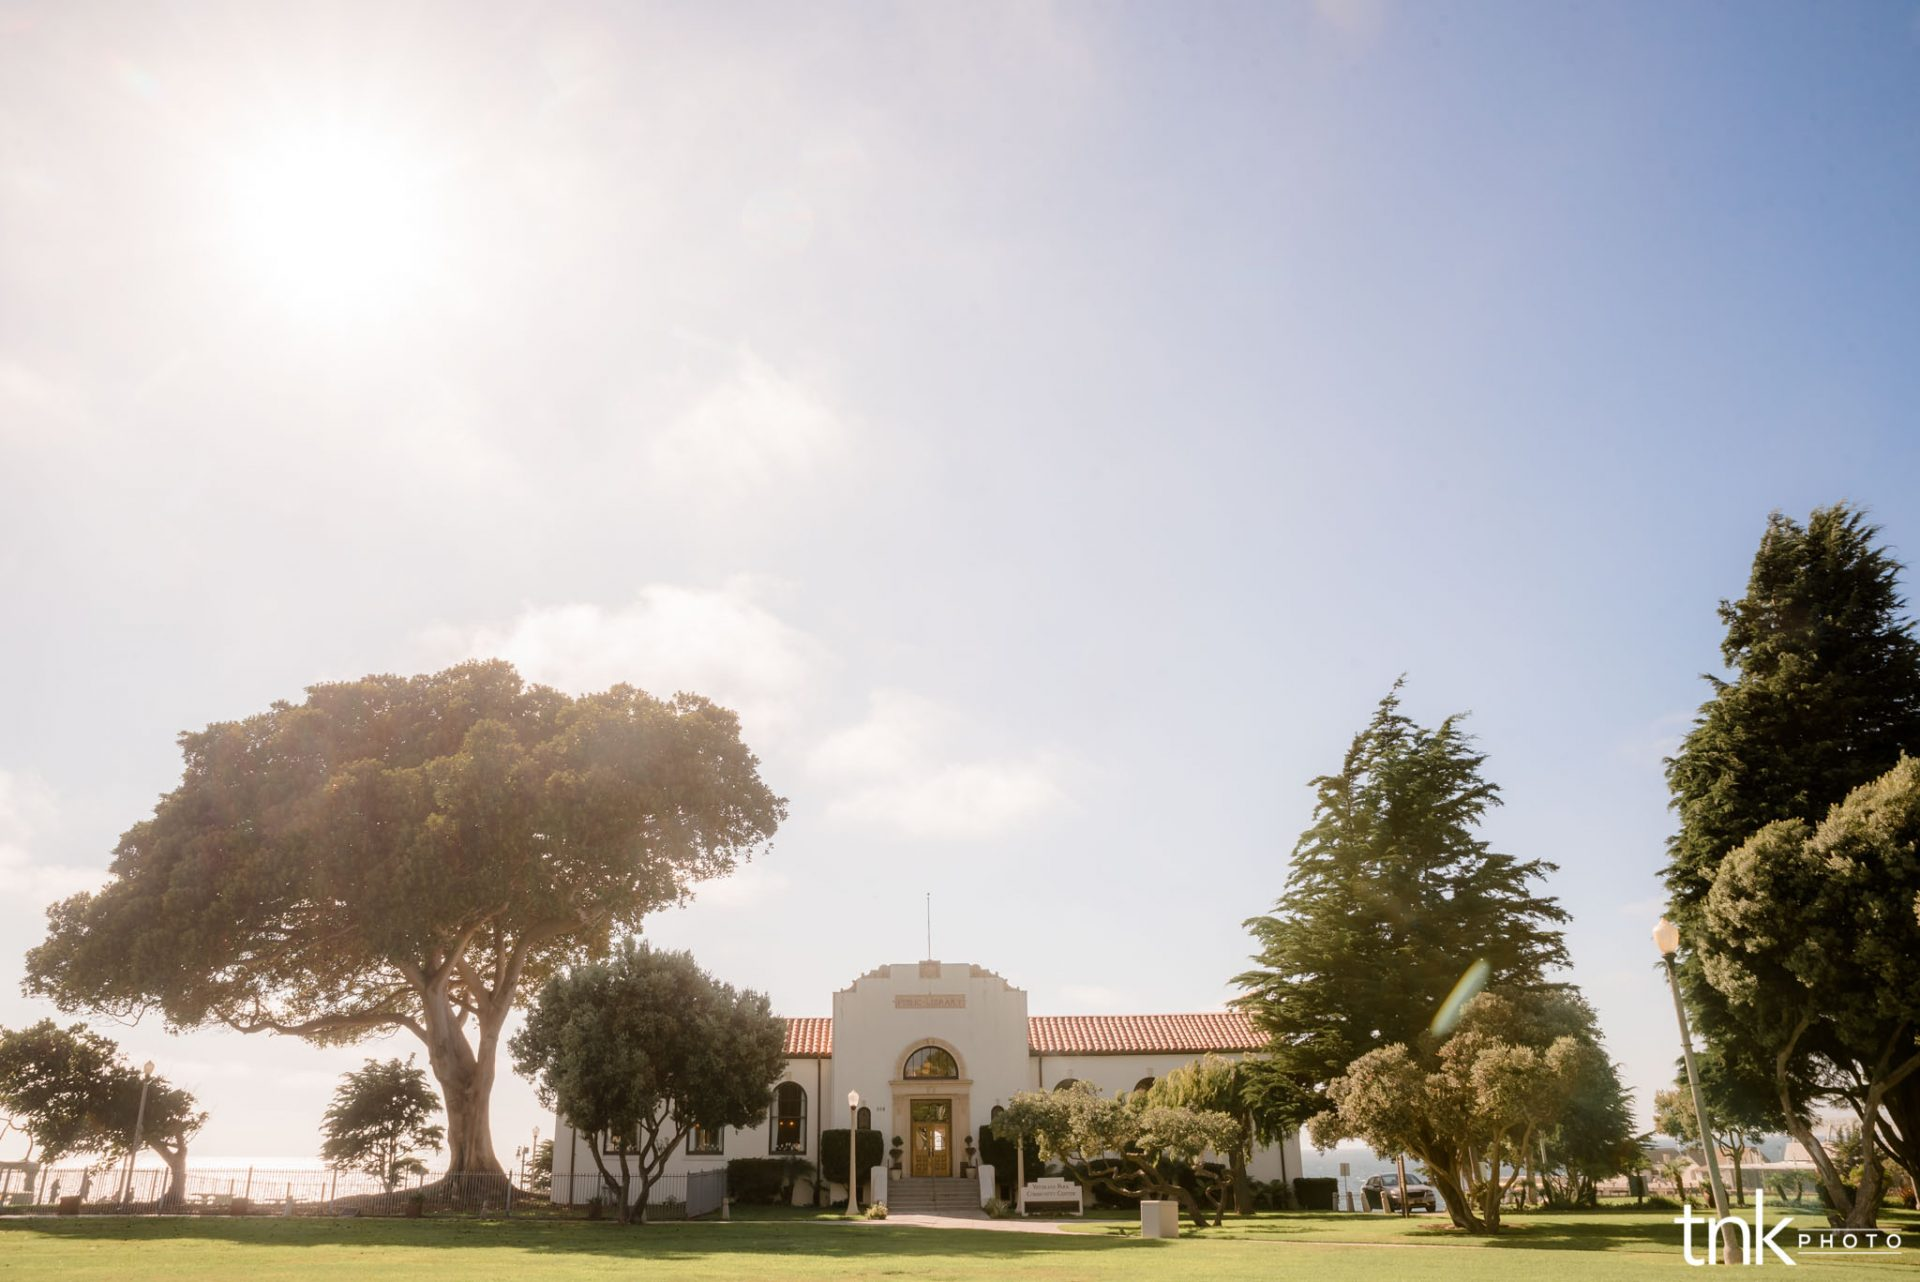 ddf4fc1e64 Redondo Beach Wedding, CA   OC Wedding Photographers